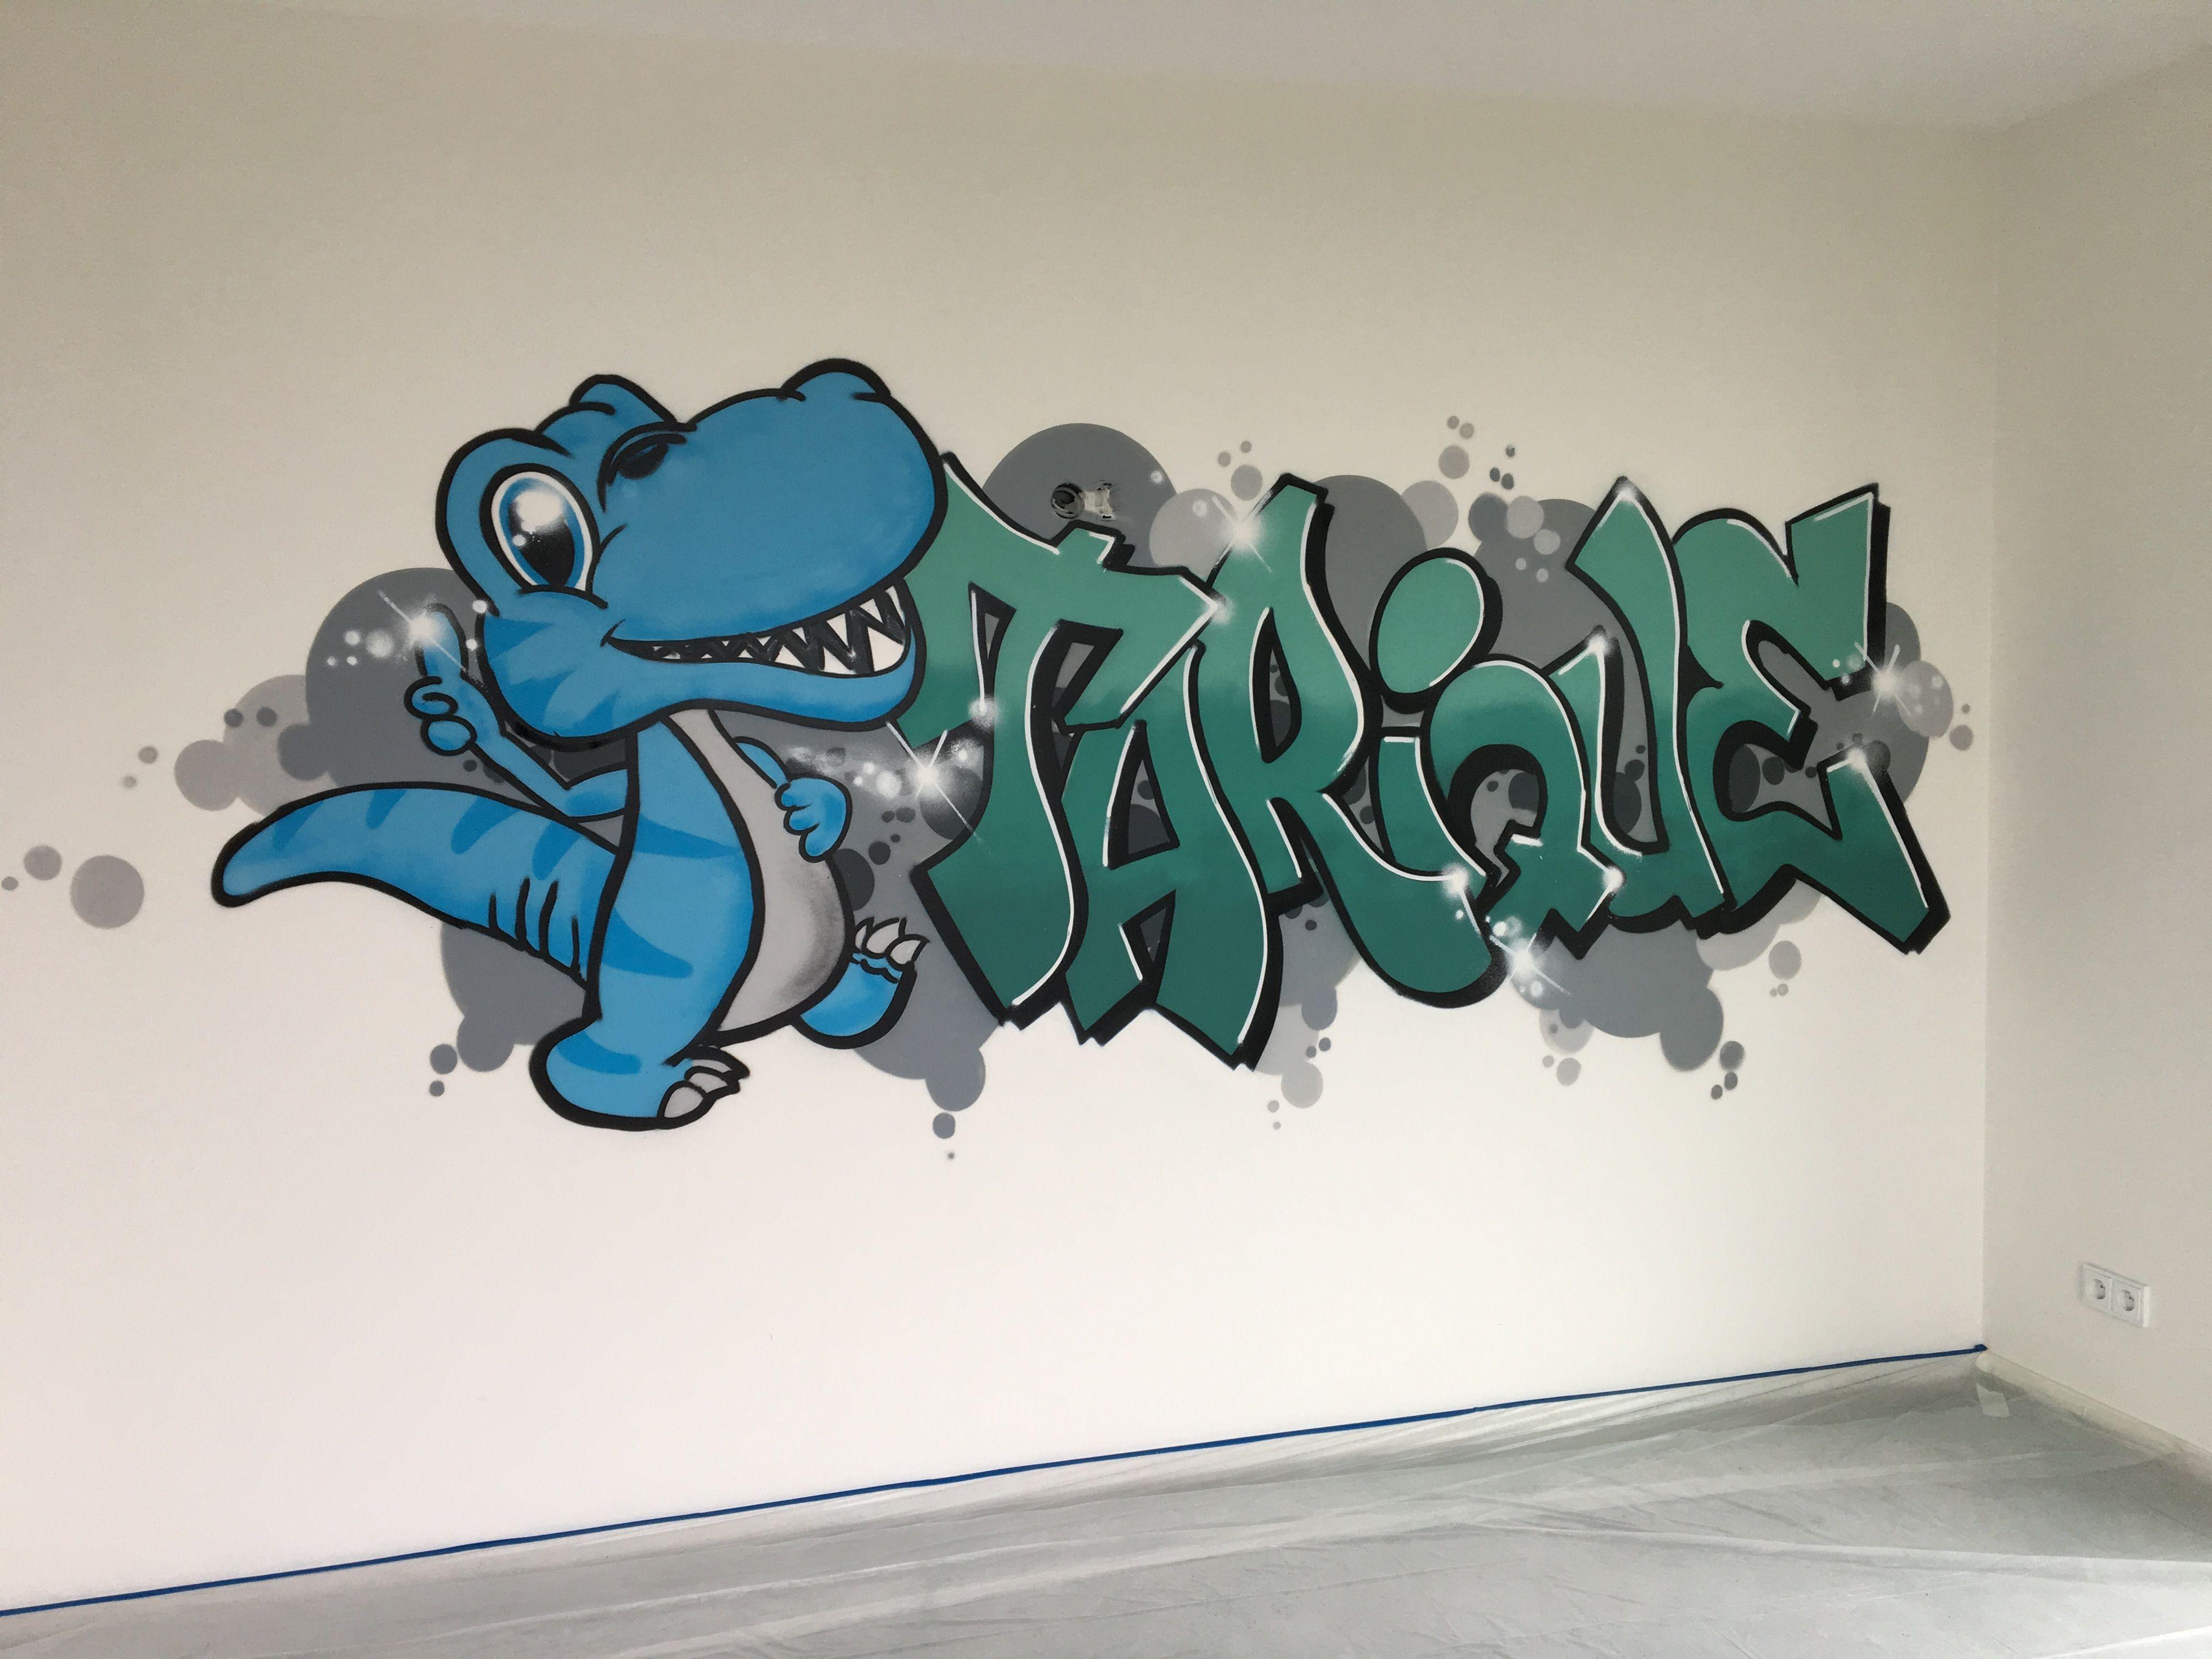 Stoere dino Graffiti slaapkamer #dino #slaapkamer #graffiti ...